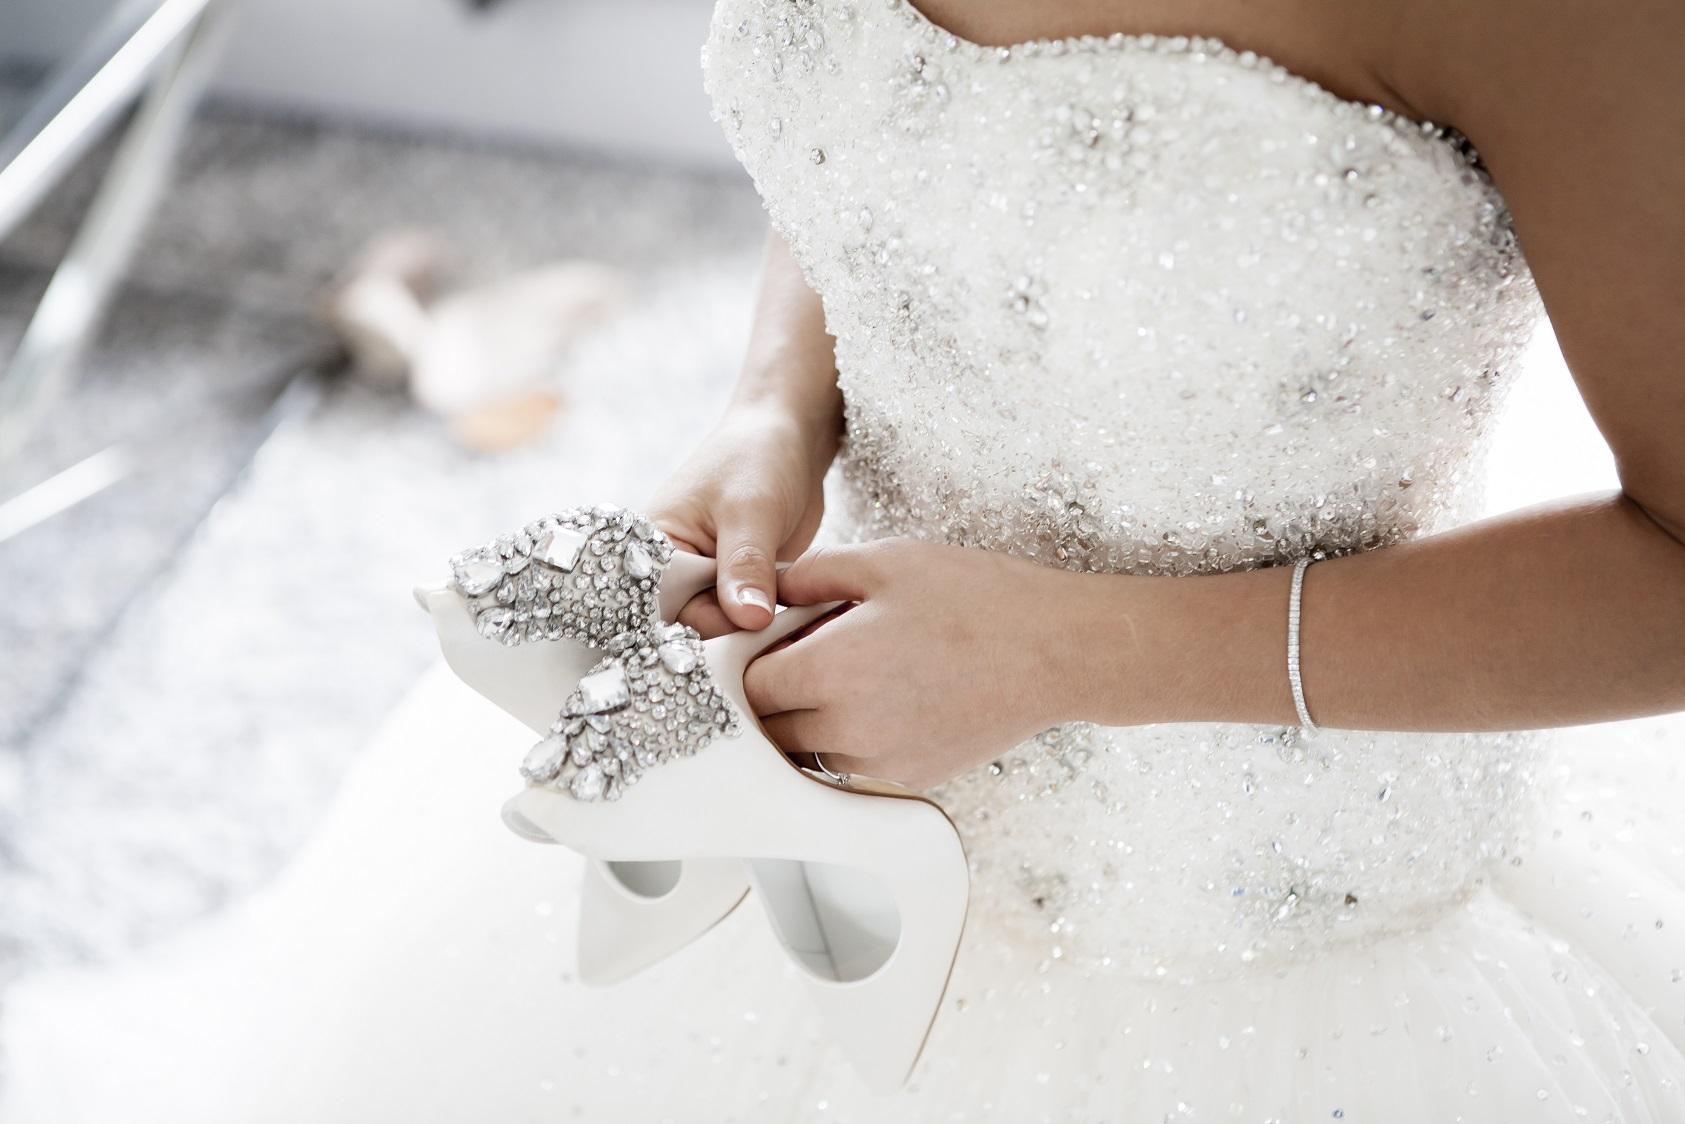 Bride Holding Her Bridal Shoes